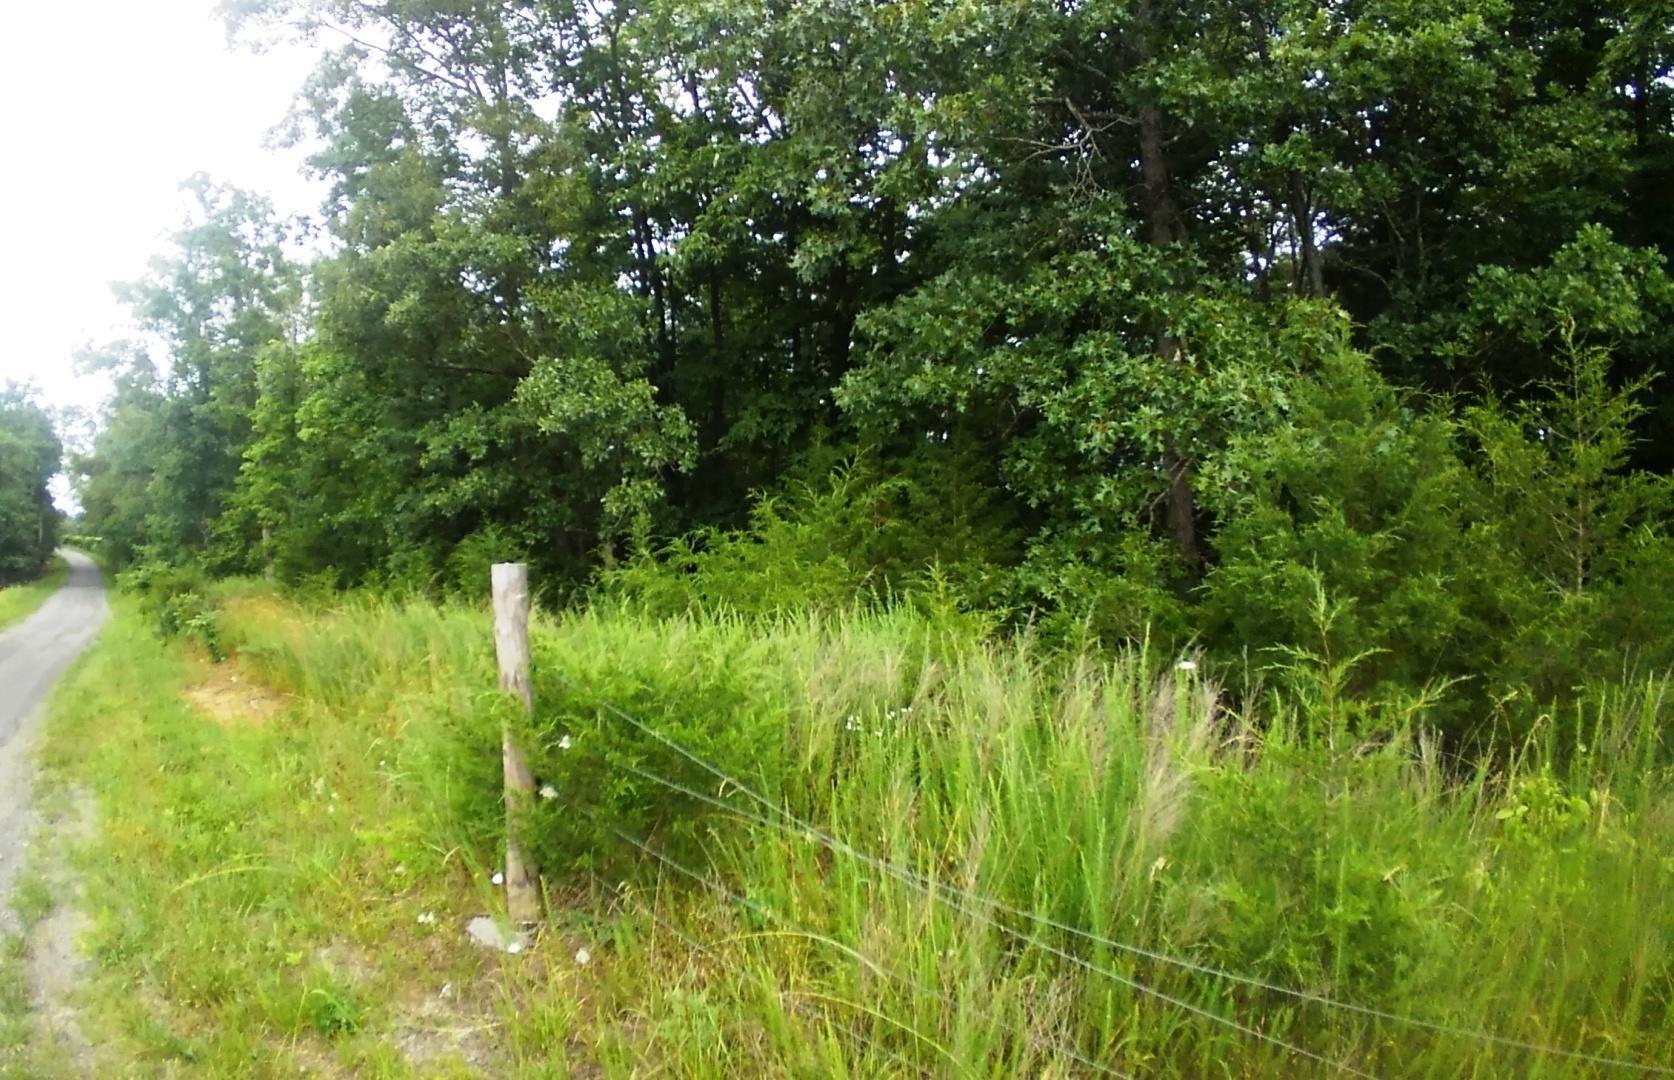 Photo of Lot 11 Smelcer Road, Mosheim, TN 37810 (MLS # 267376)